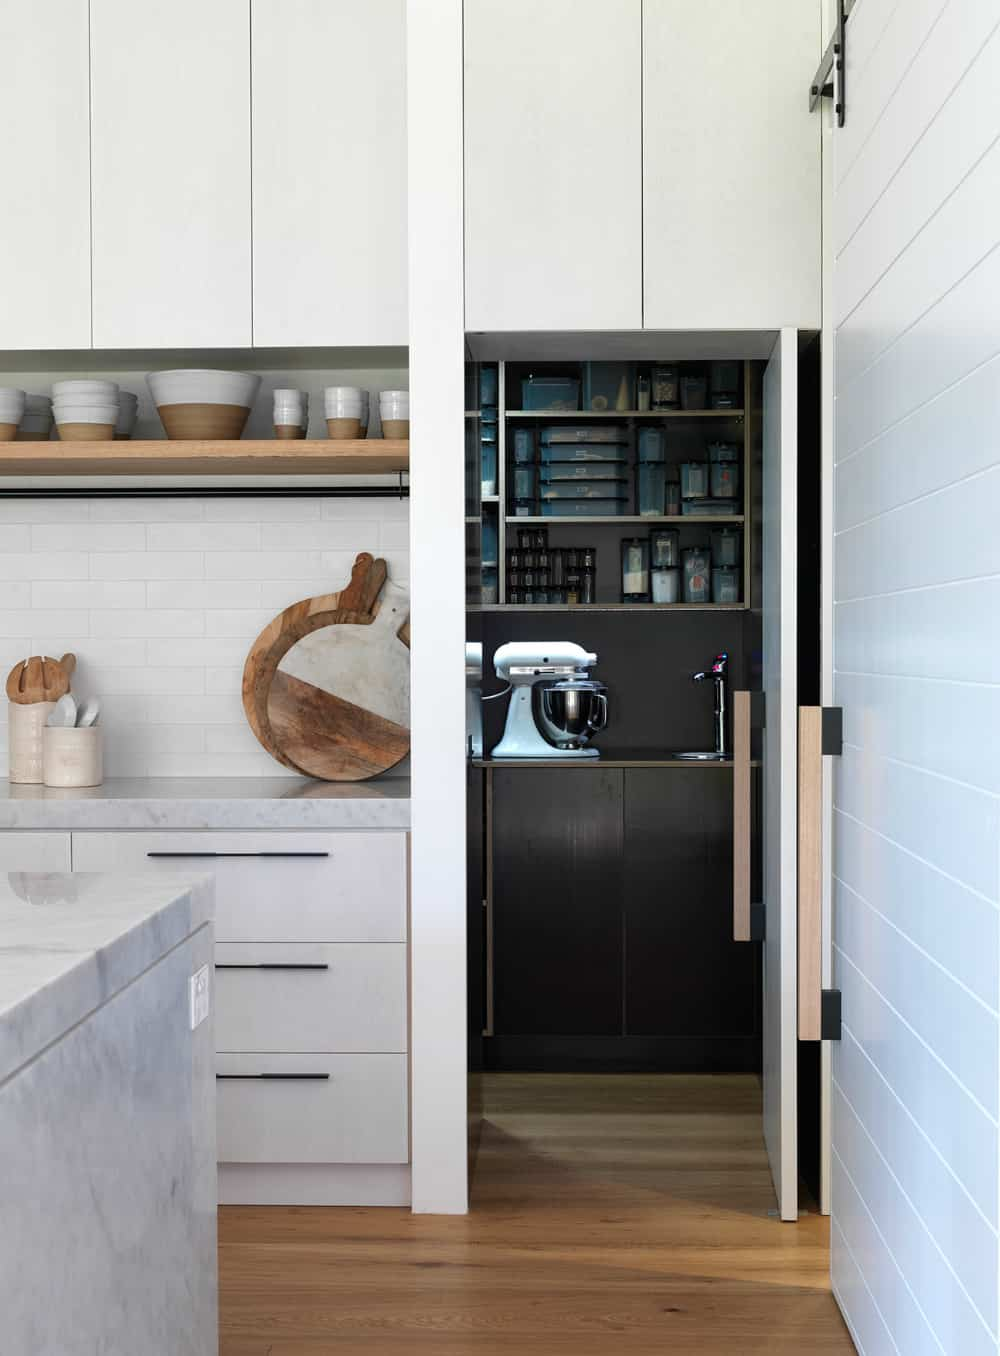 The Bondi Barn pantry